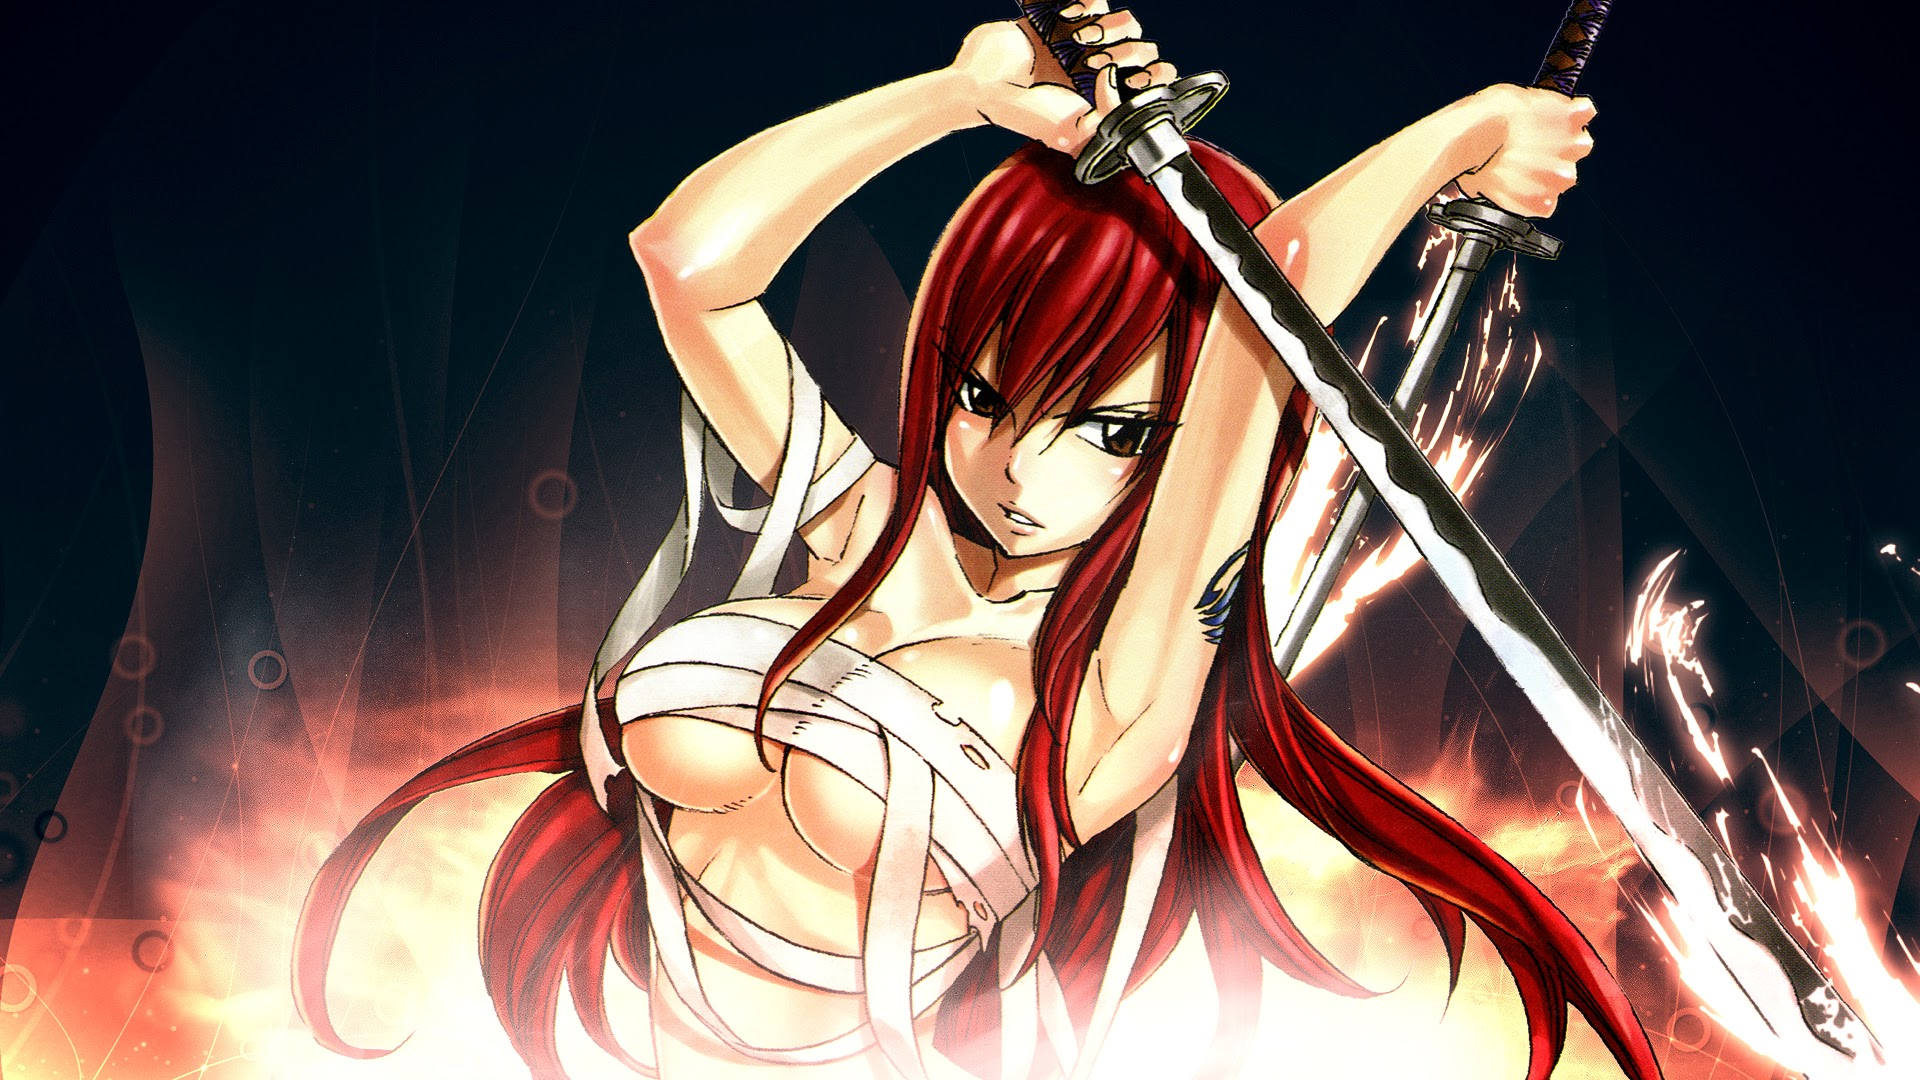 Erza Scarlet Katana Fairy Tail 7b Wallpaper HD 1920x1080